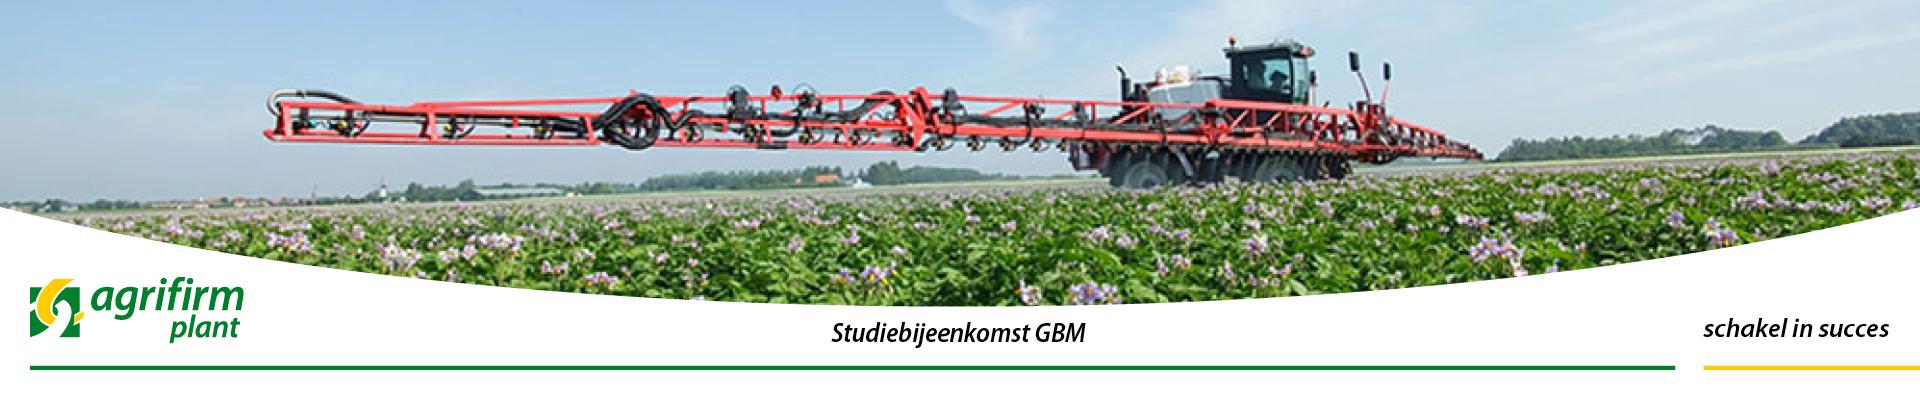 Studiebijeenkomst GBM in regio Noord Holland